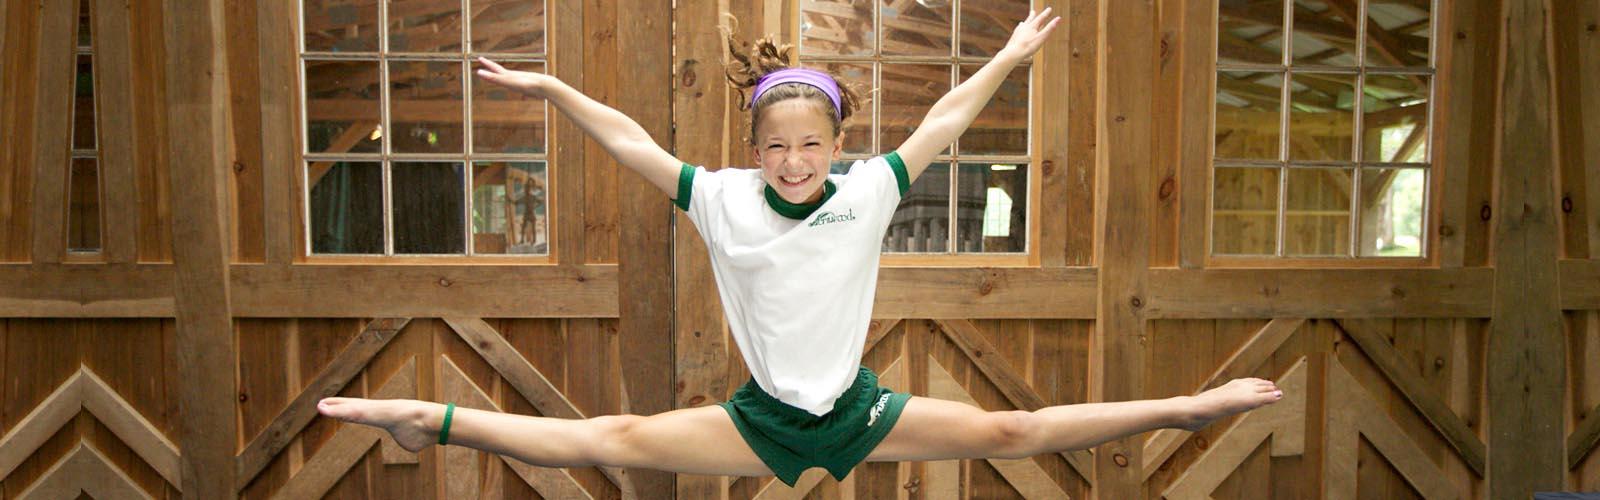 wide_gymnast_sm